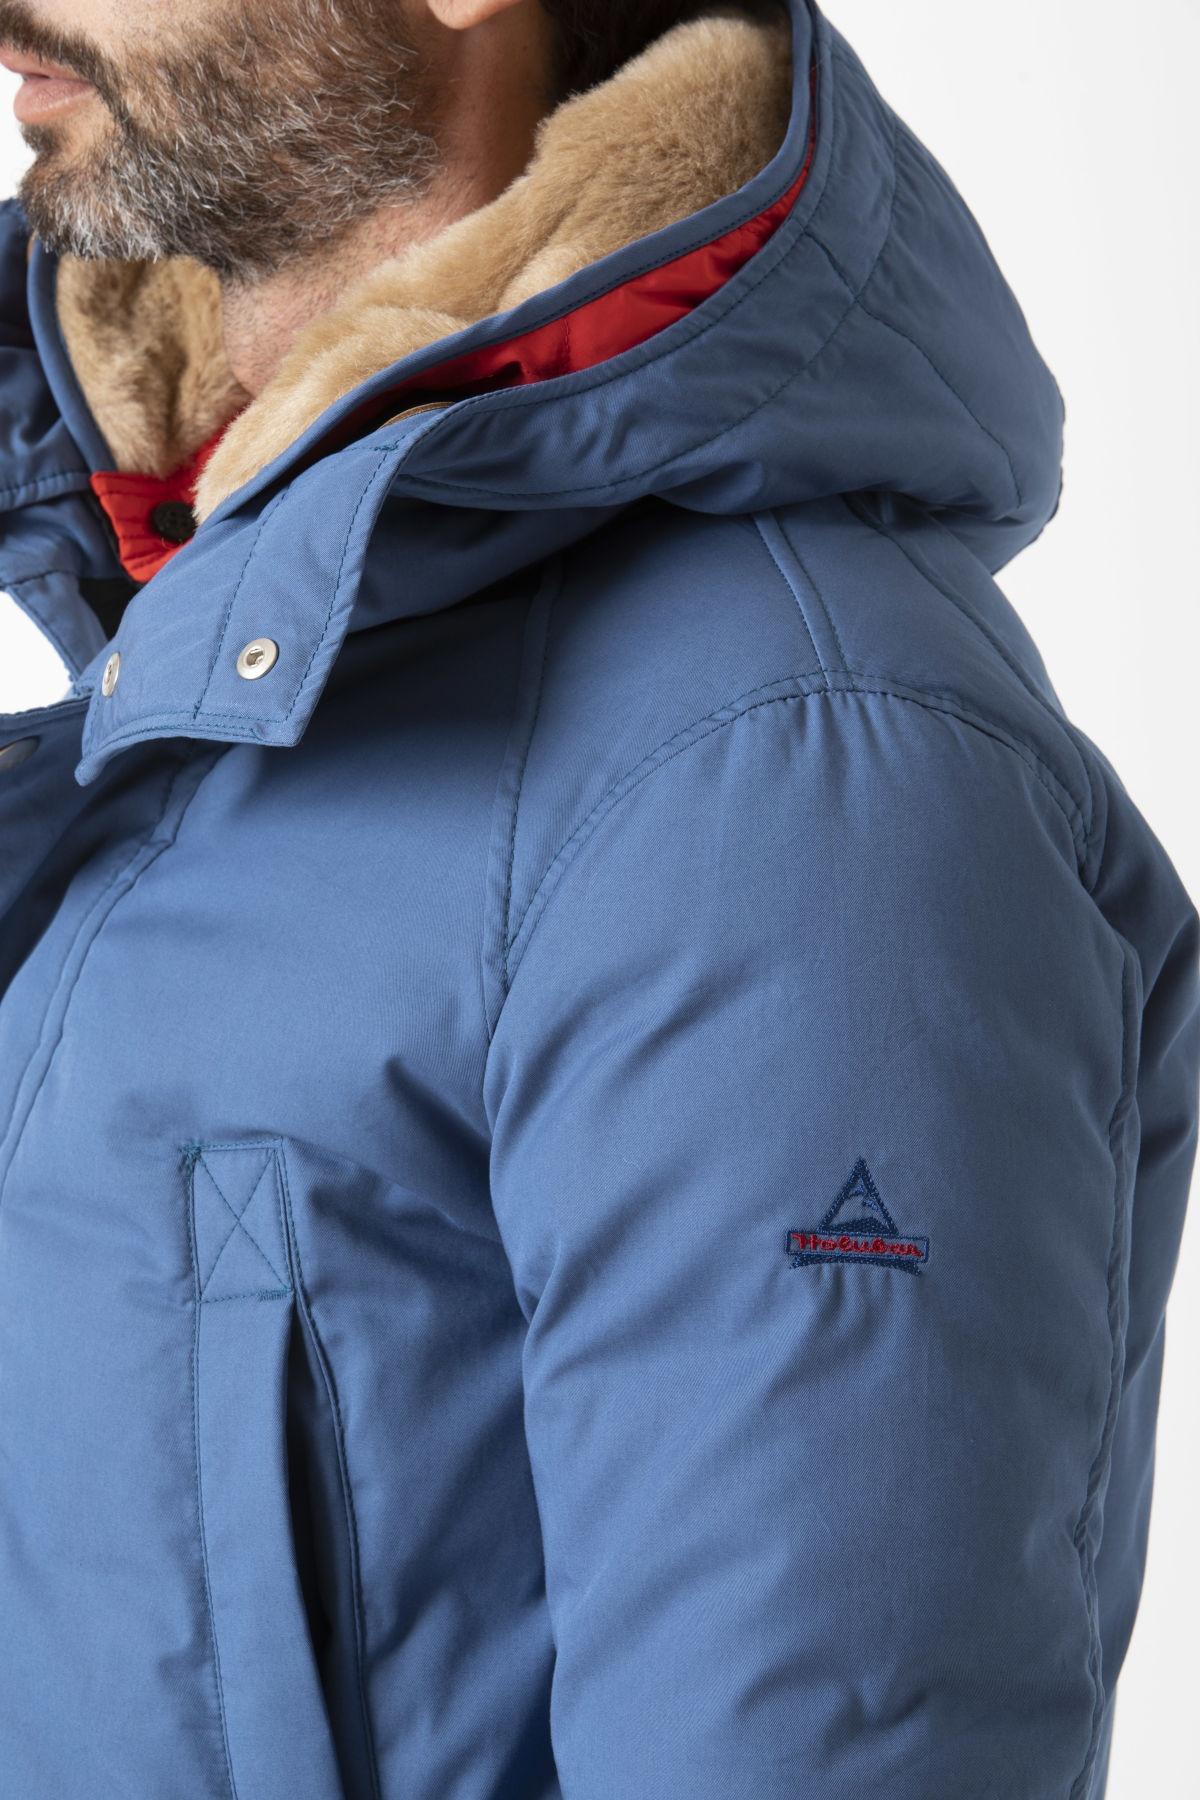 SHORT BOULDER Jacket for man HOLUBAR F/W